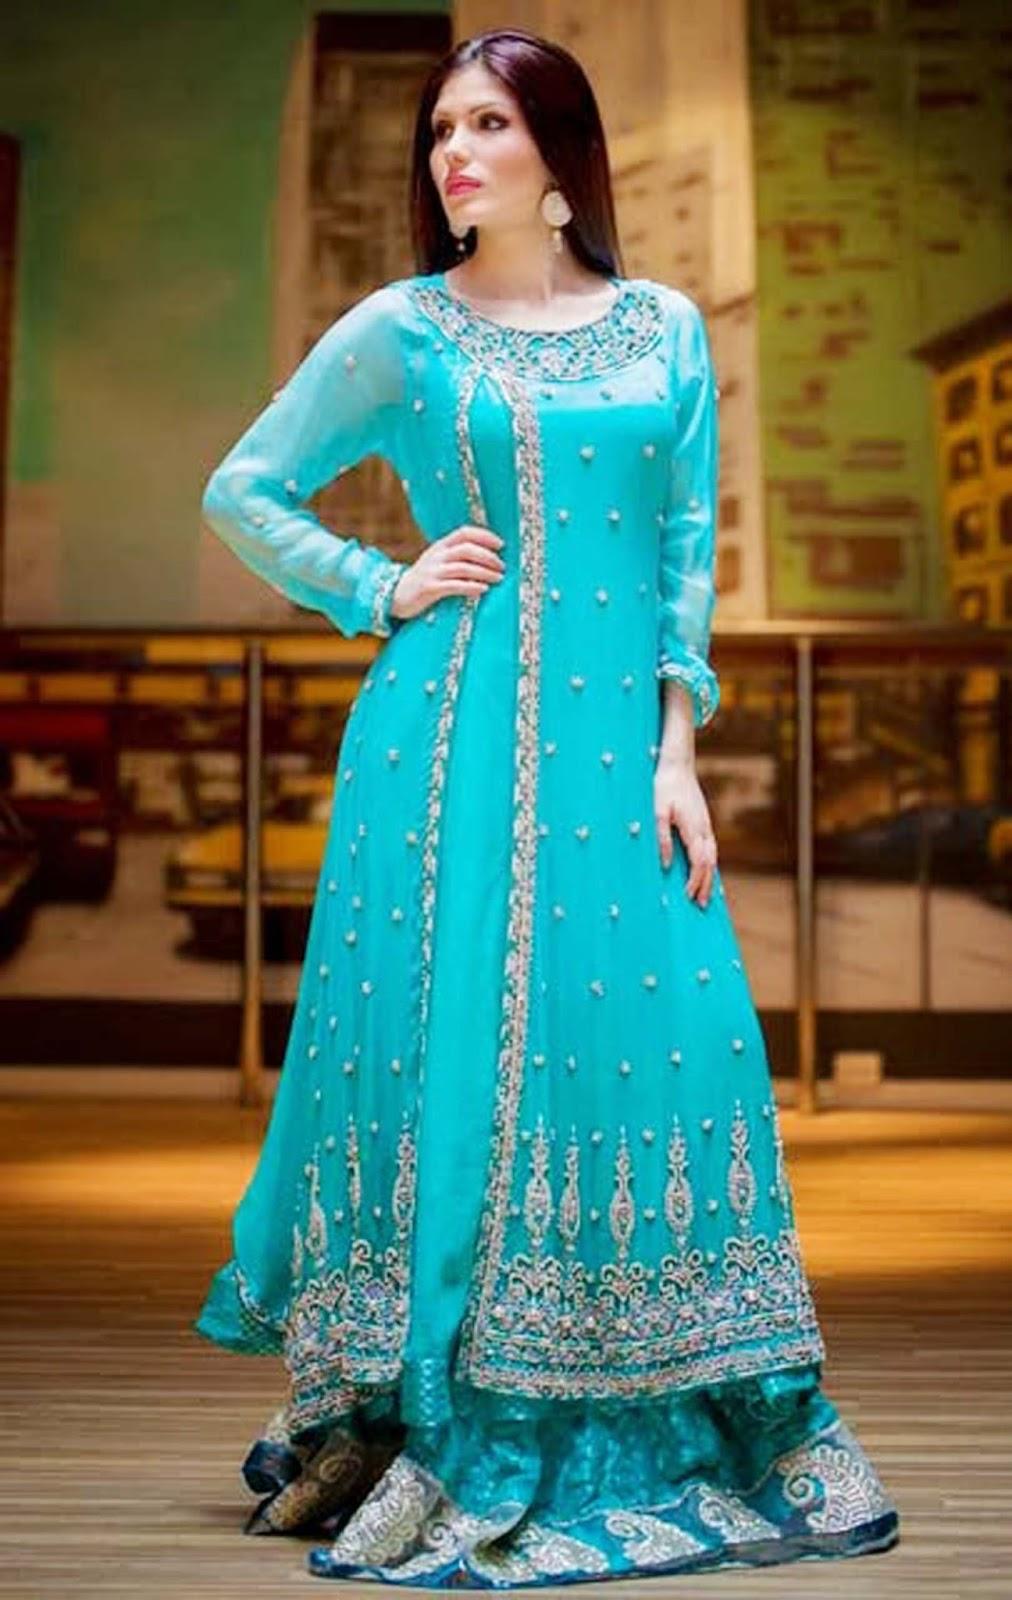 pak wedding dresses 2015 photo - 1